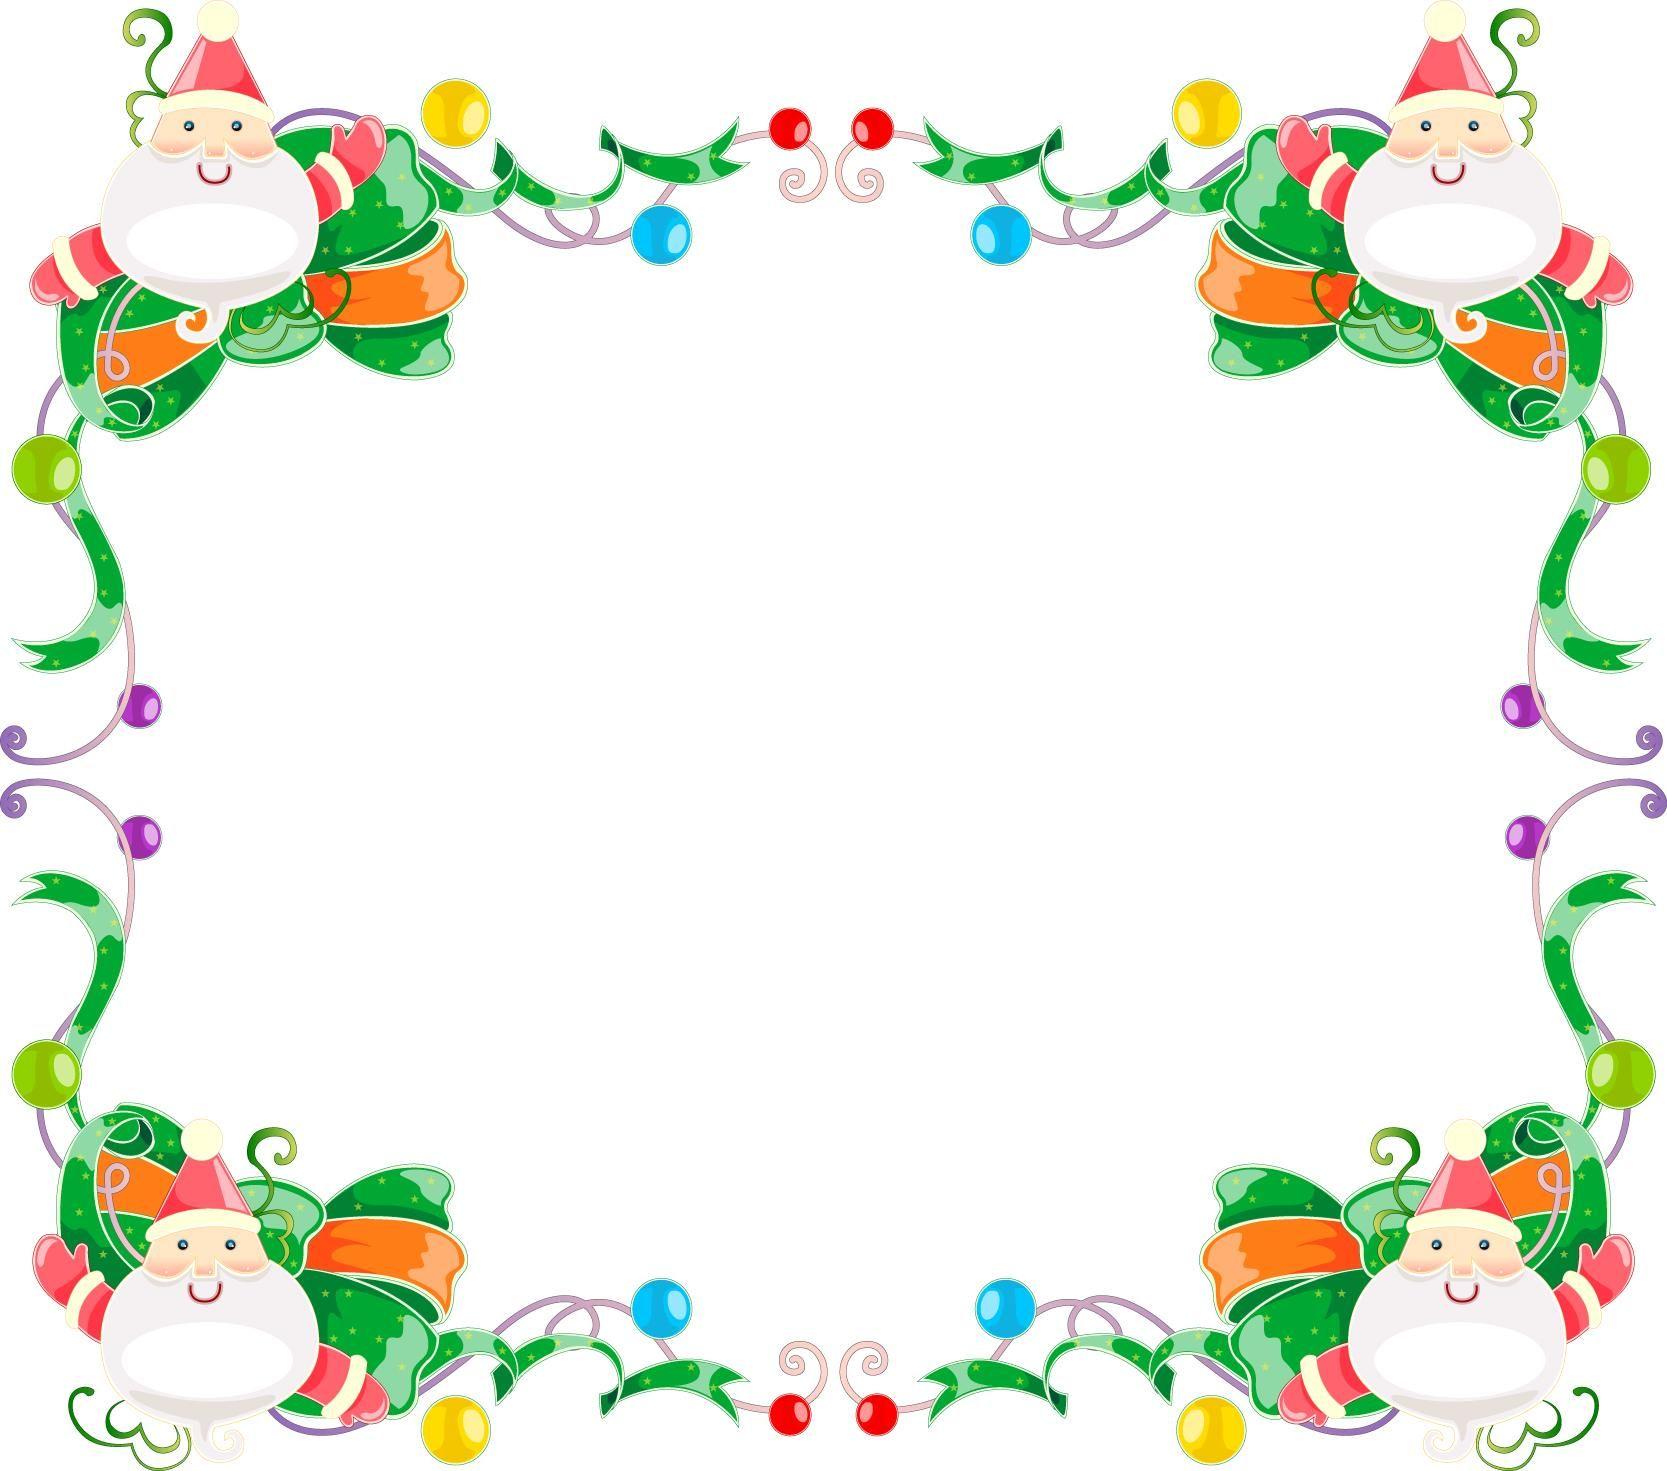 Christmas Border Design.Xmas Border Designs Mikulas Santa Claus Free Christmas